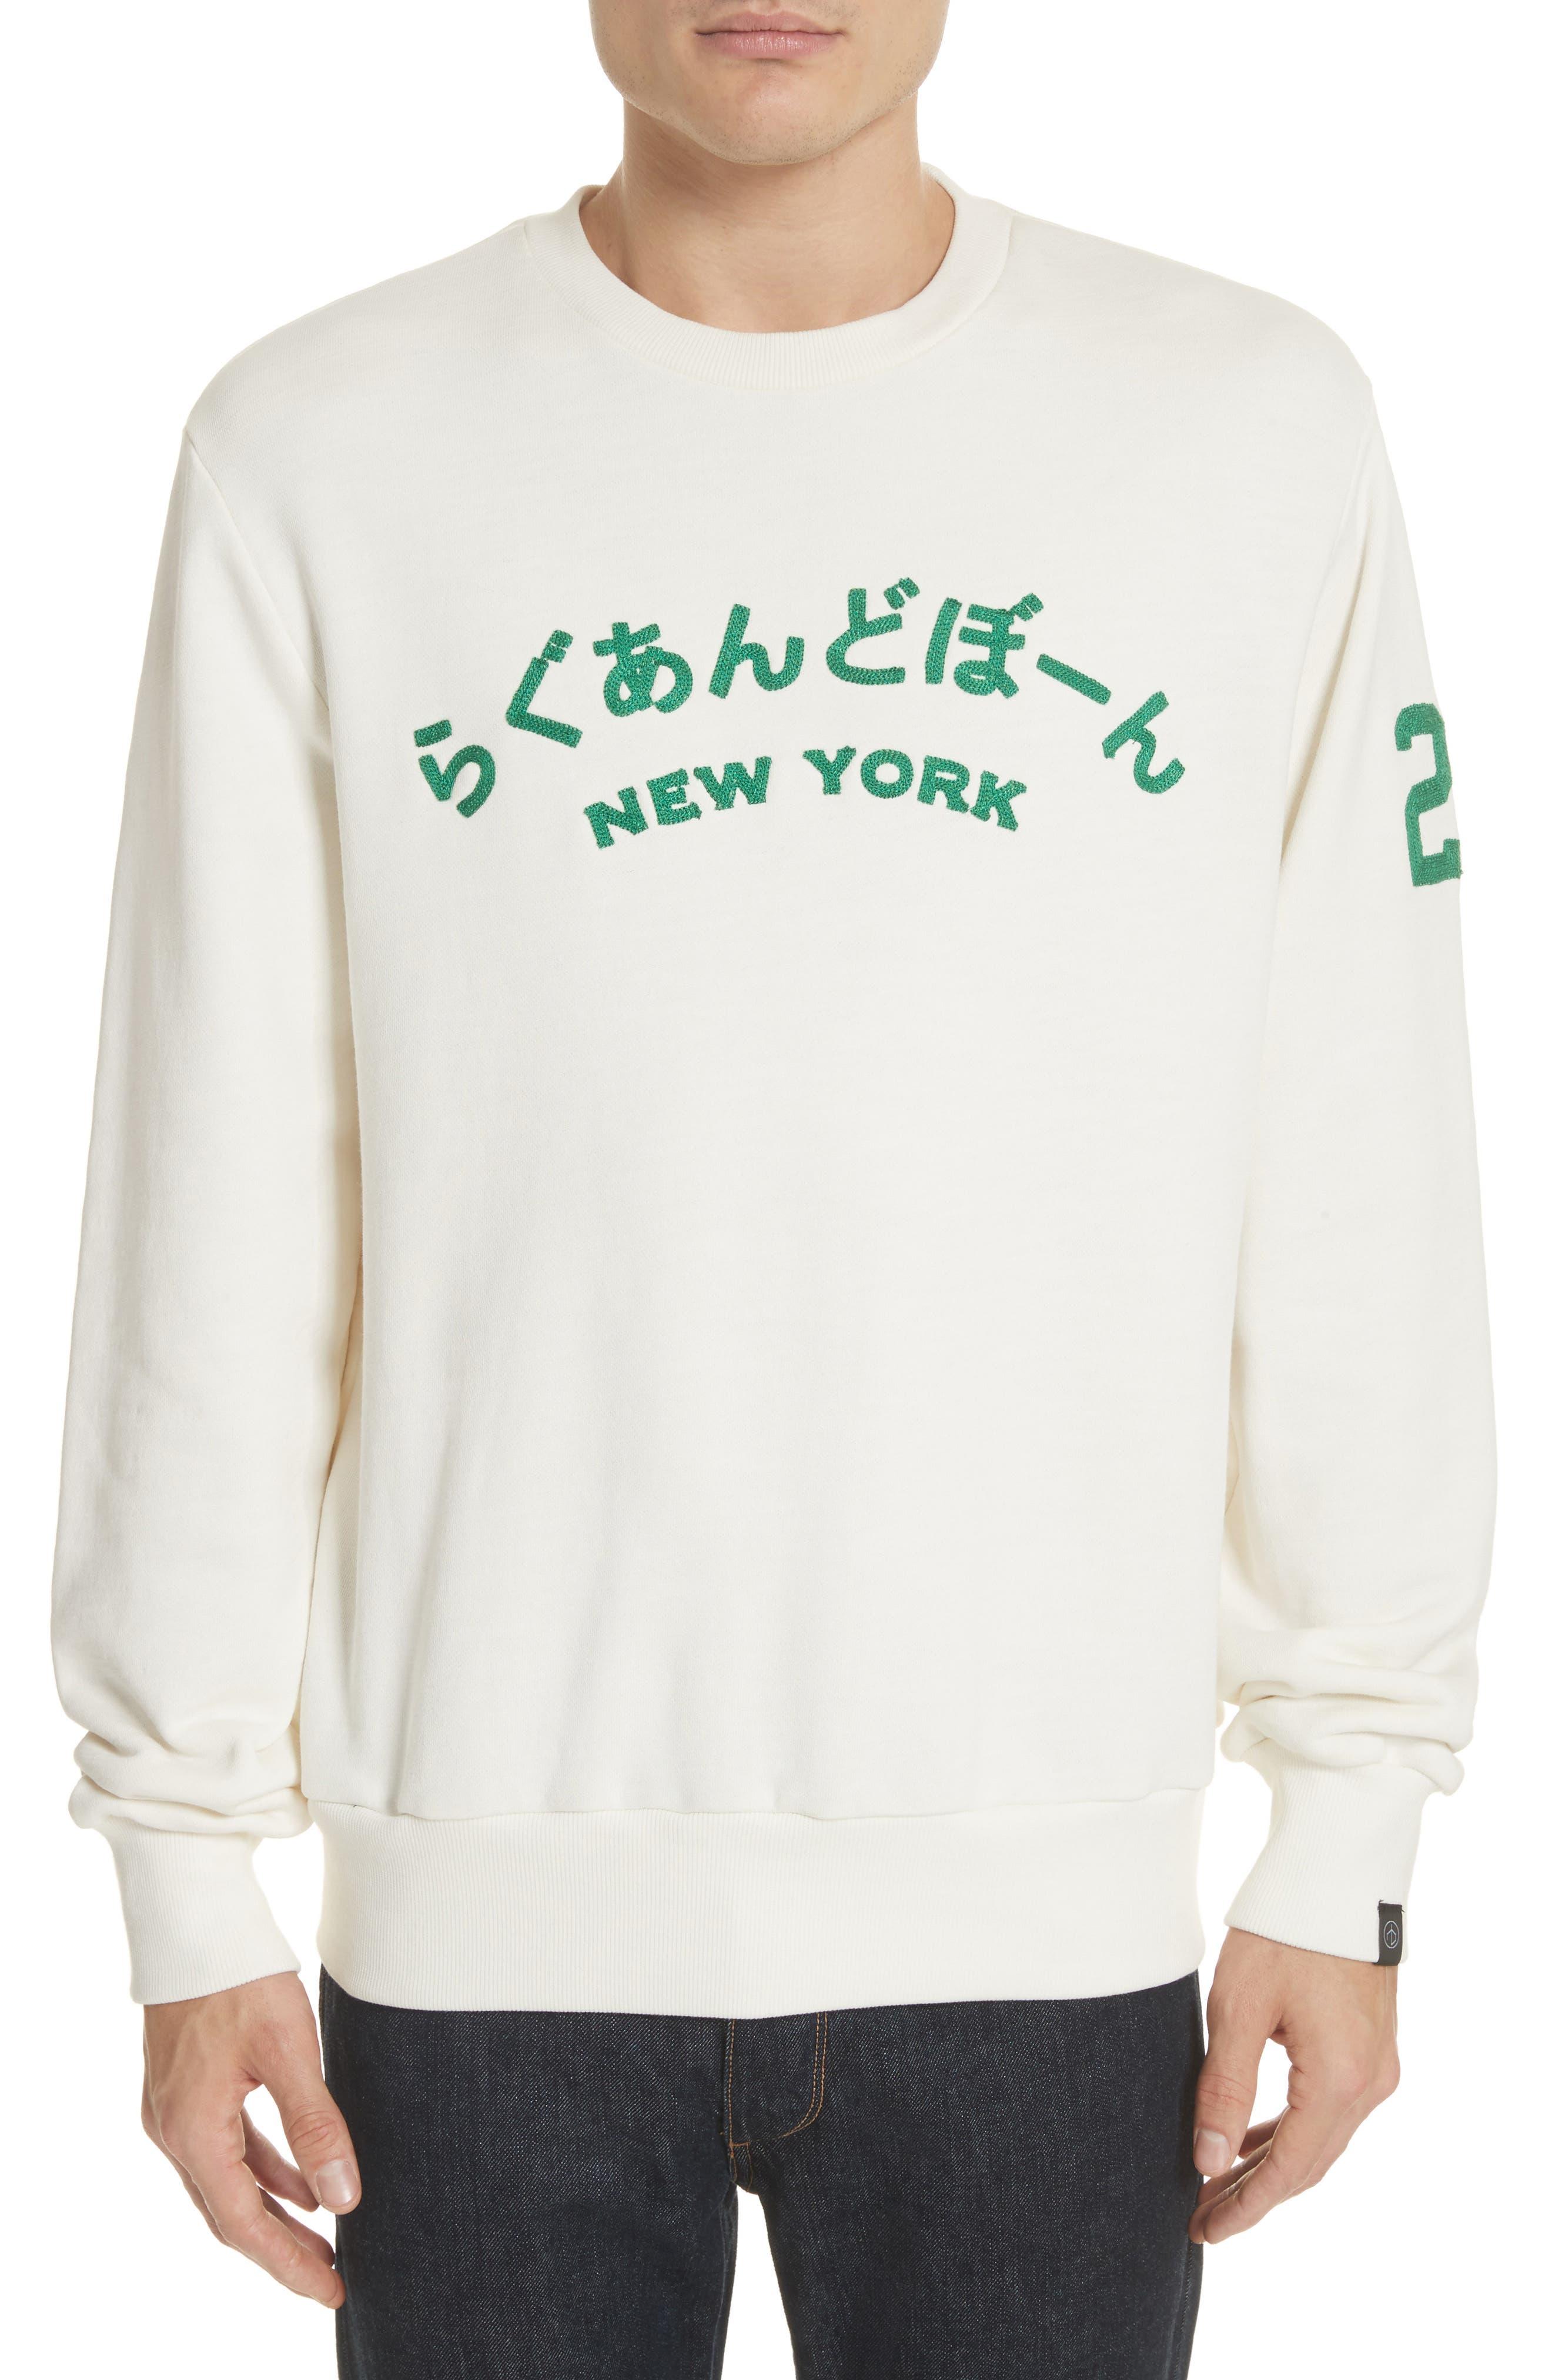 Alternate Image 1 Selected - rag & bone Japan Embroidered Crewneck Sweatshirt